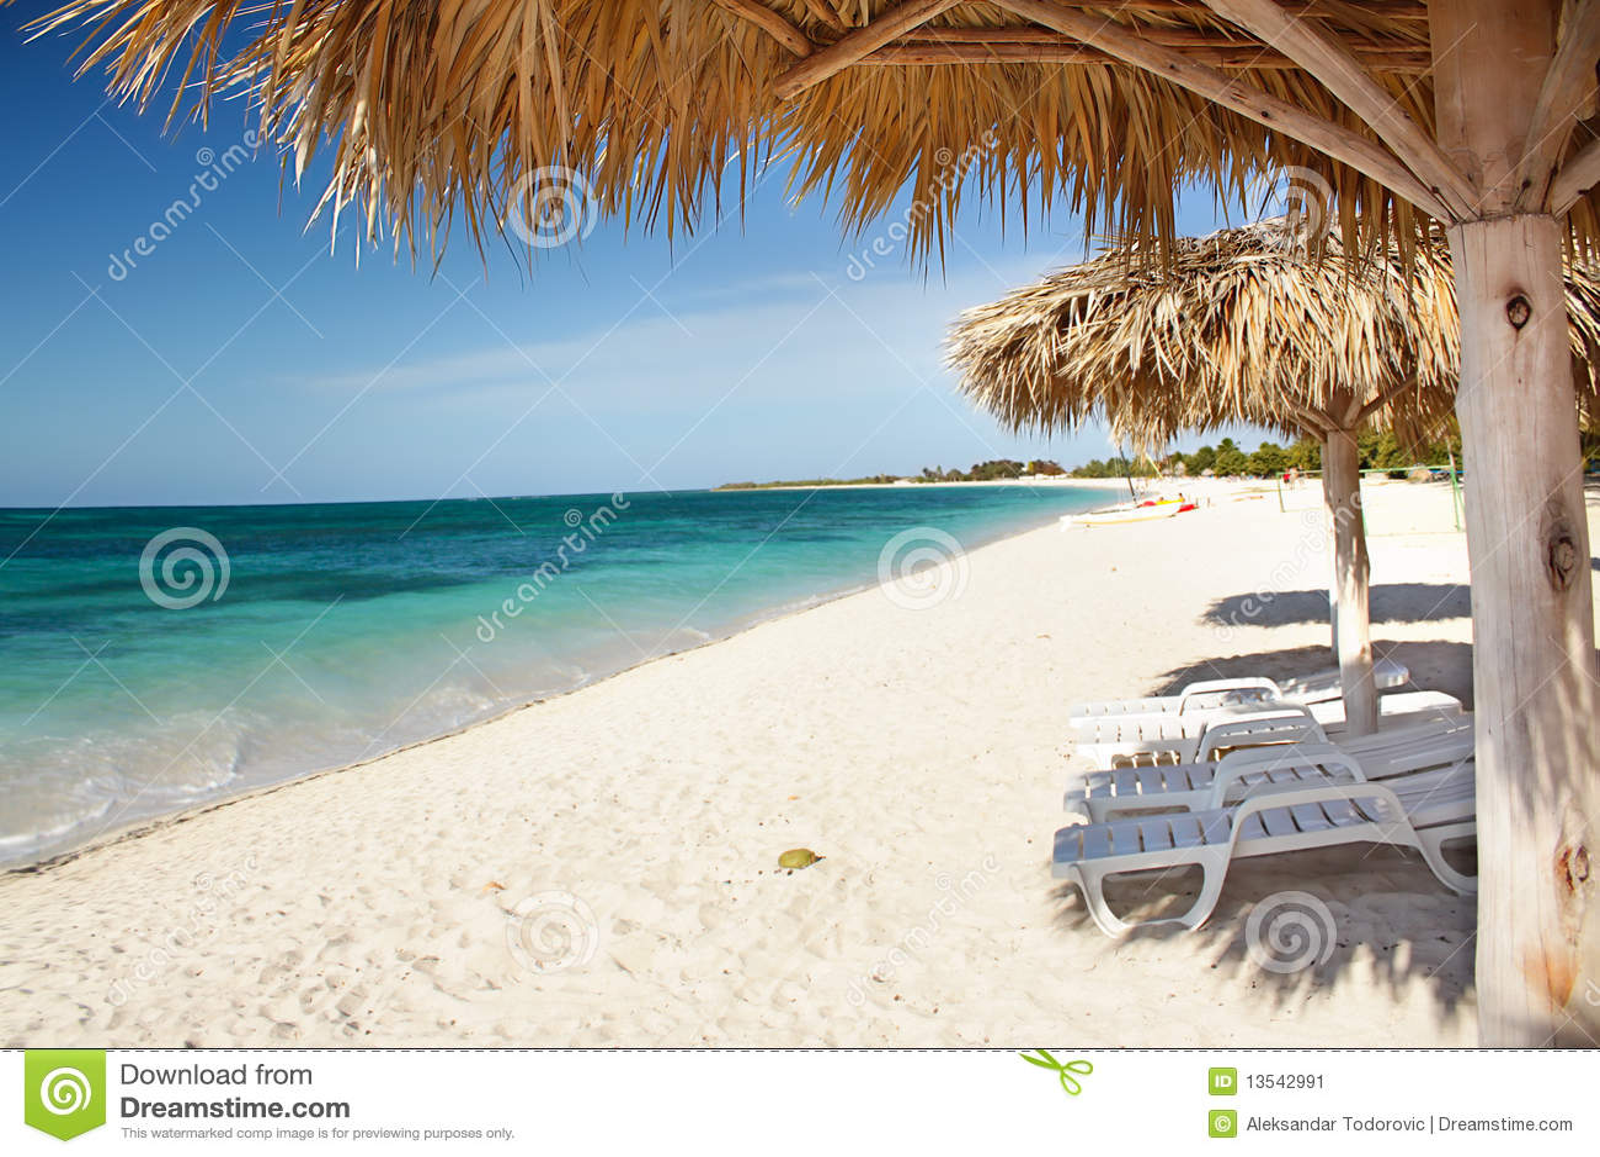 Beach purenudism The Guardian: